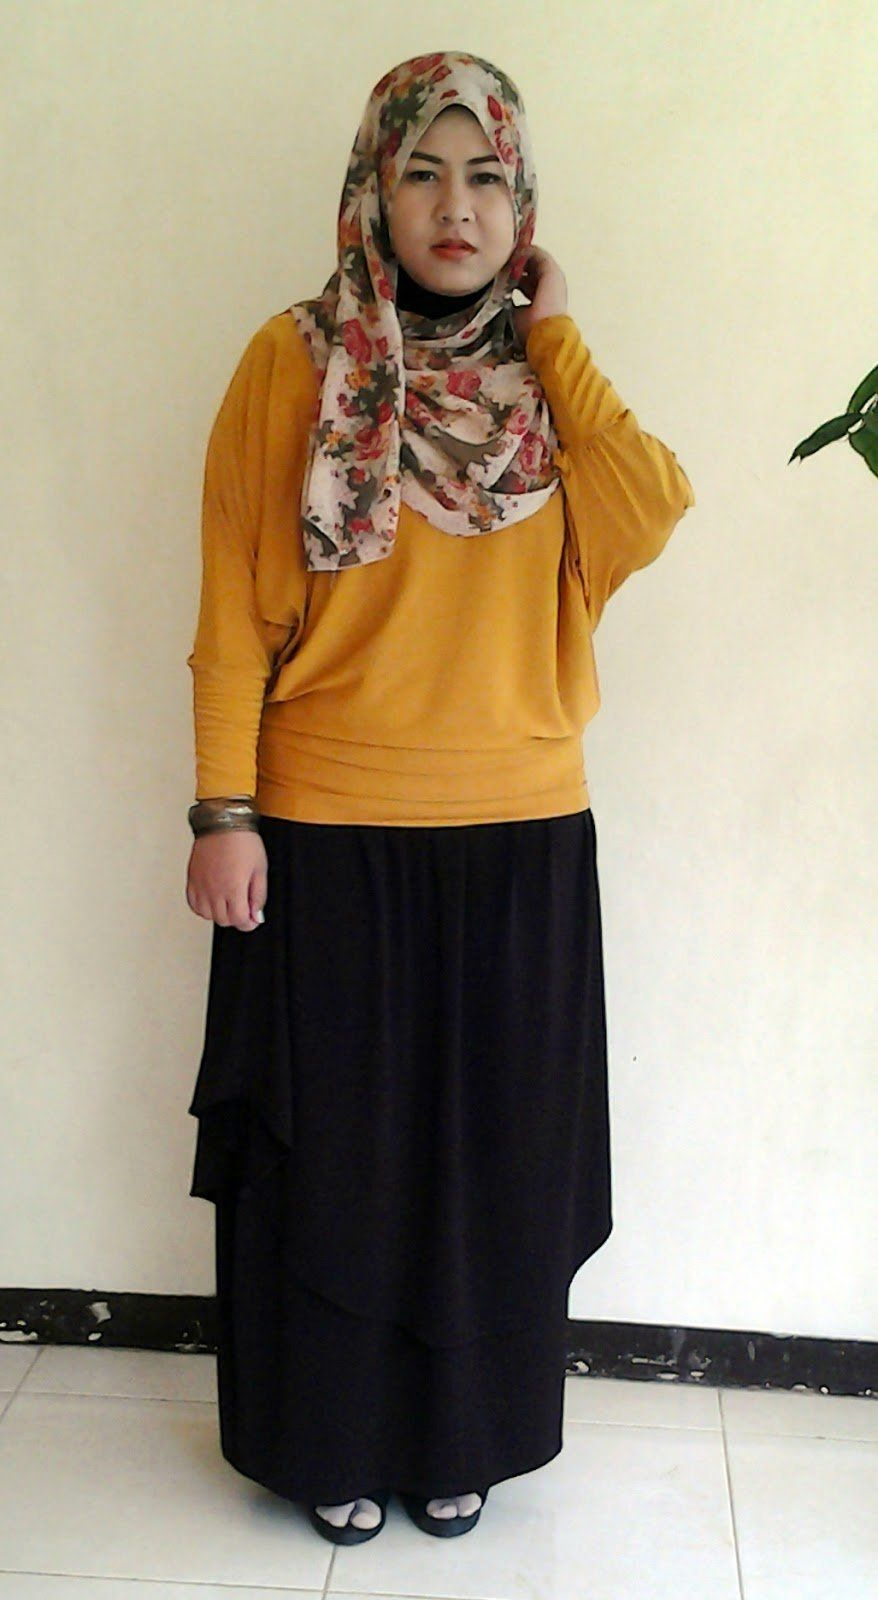 Baju Warna Kuning Kunyit Cocok Dengan Jilbab Warna Apa